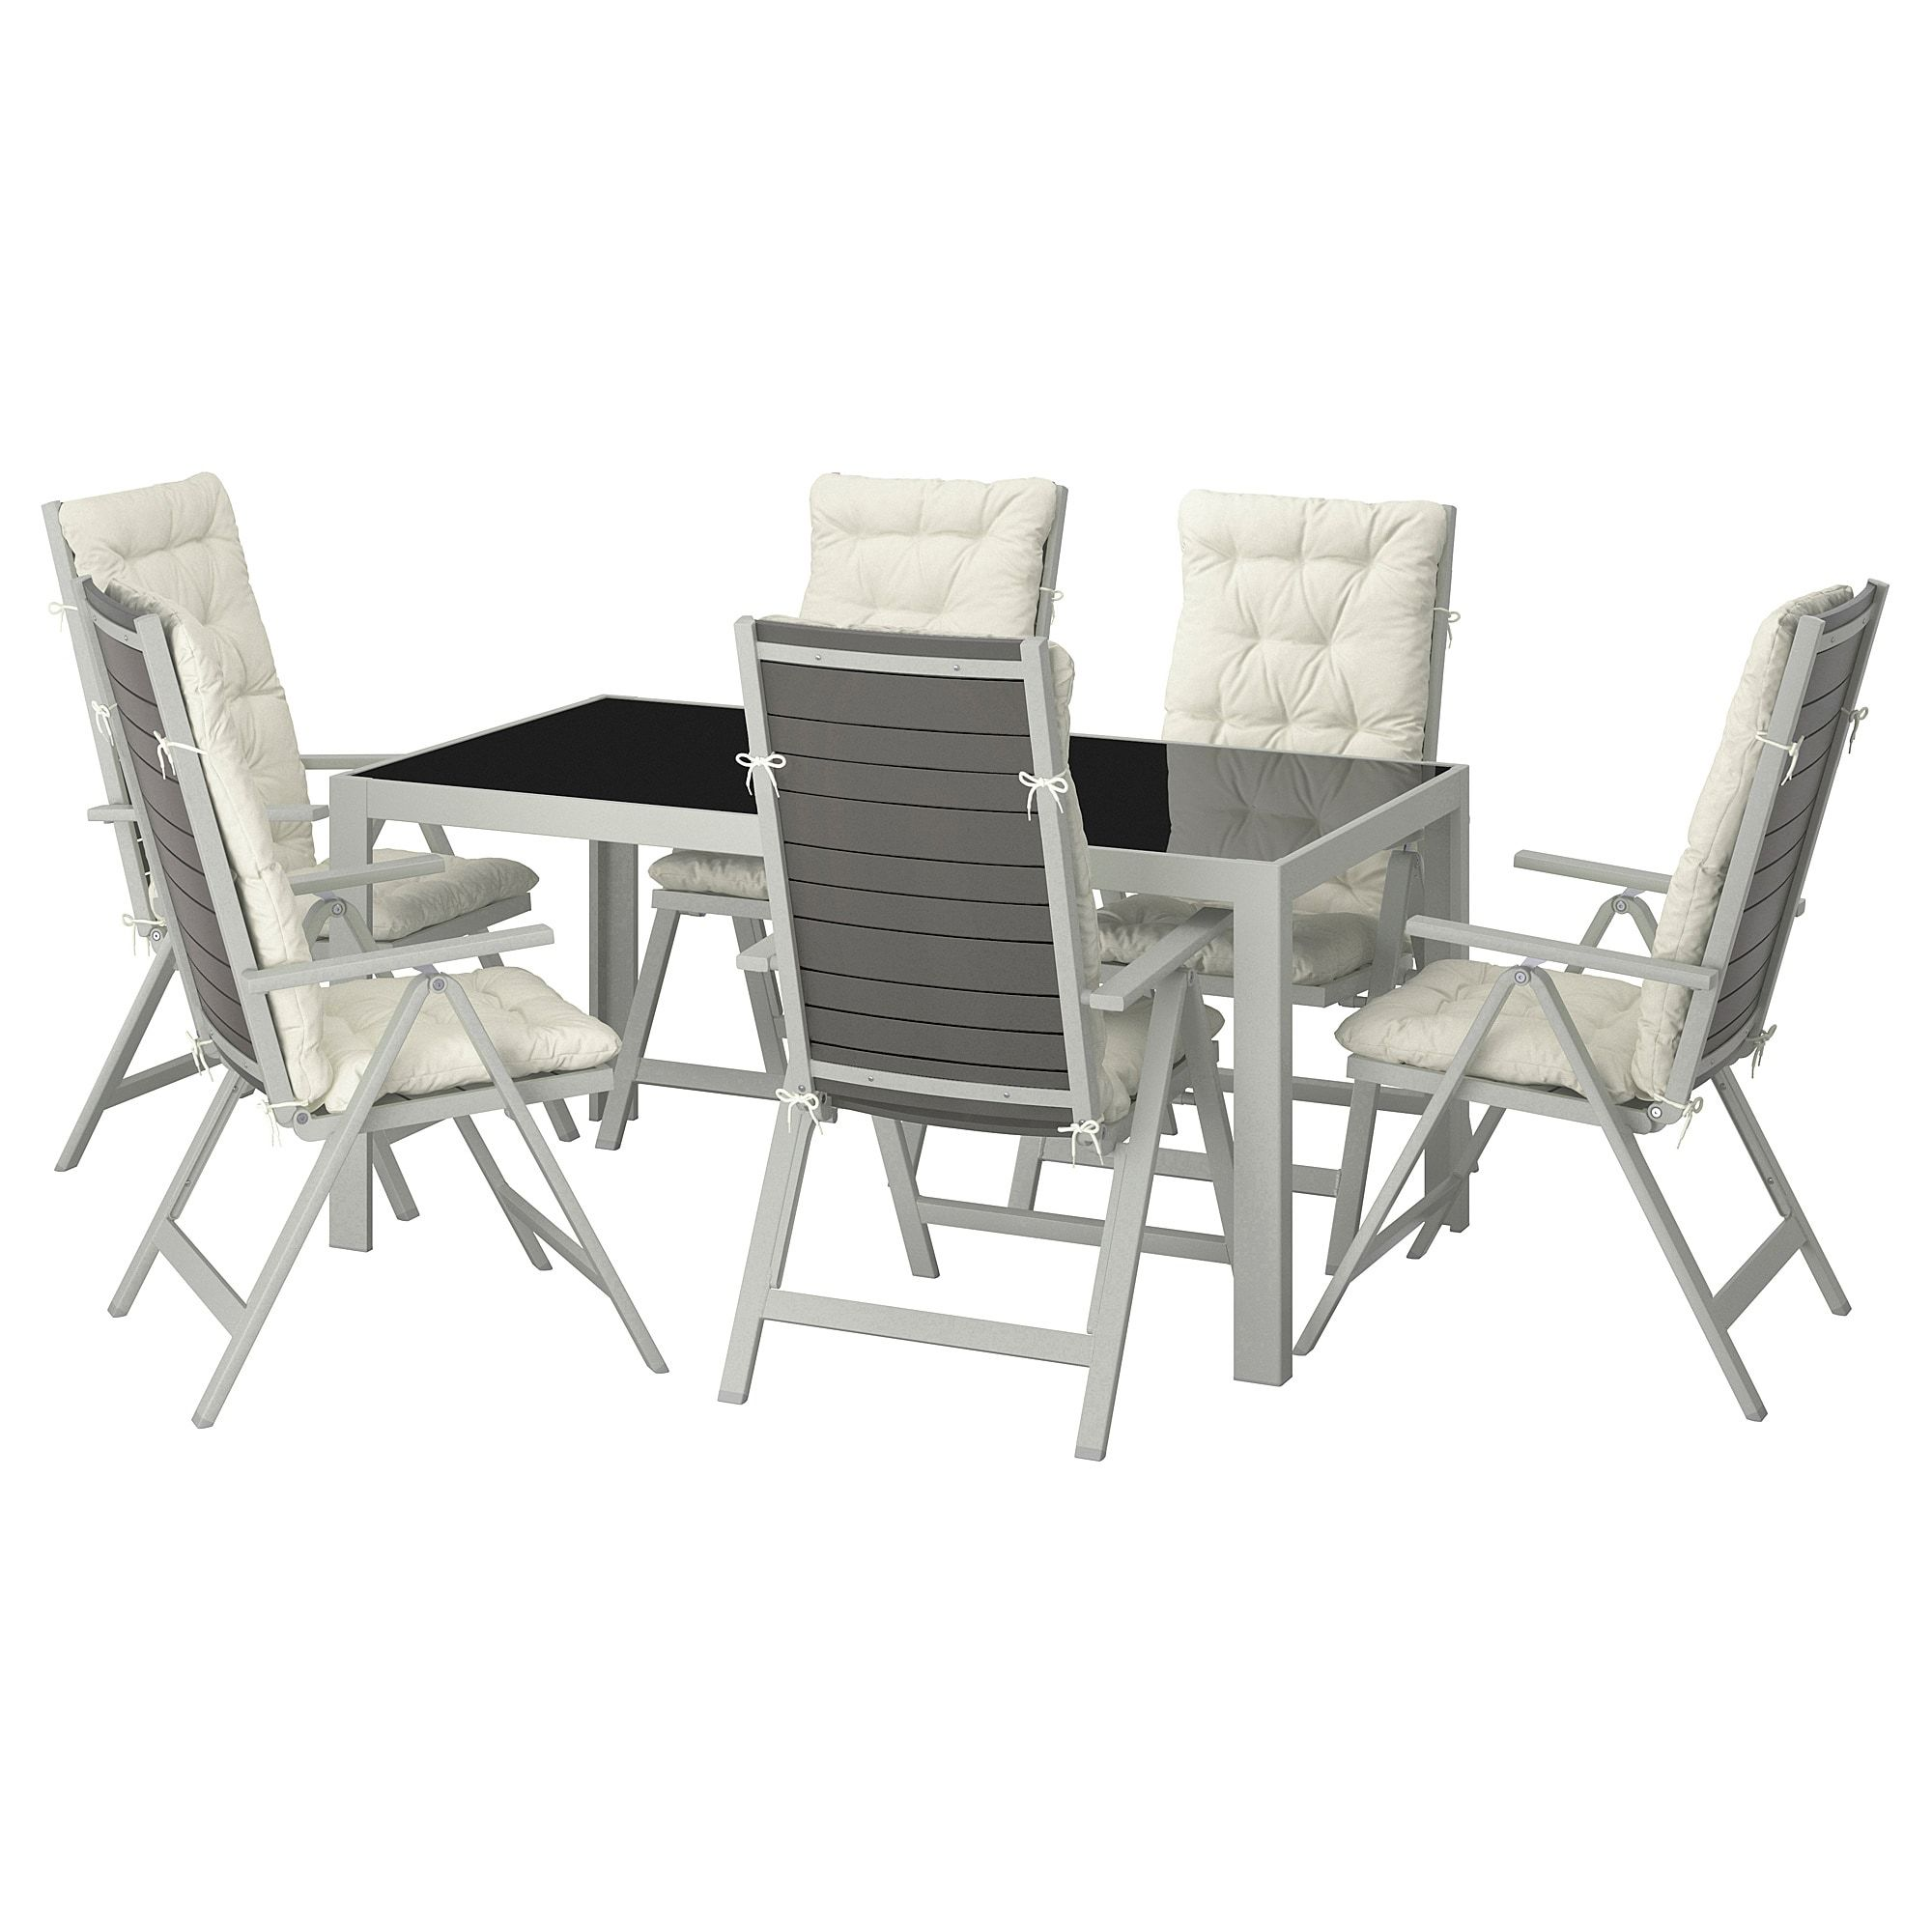 Tremendous Ikea Sjalland Glass Kuddarna Beige Table 6 Reclining Unemploymentrelief Wooden Chair Designs For Living Room Unemploymentrelieforg